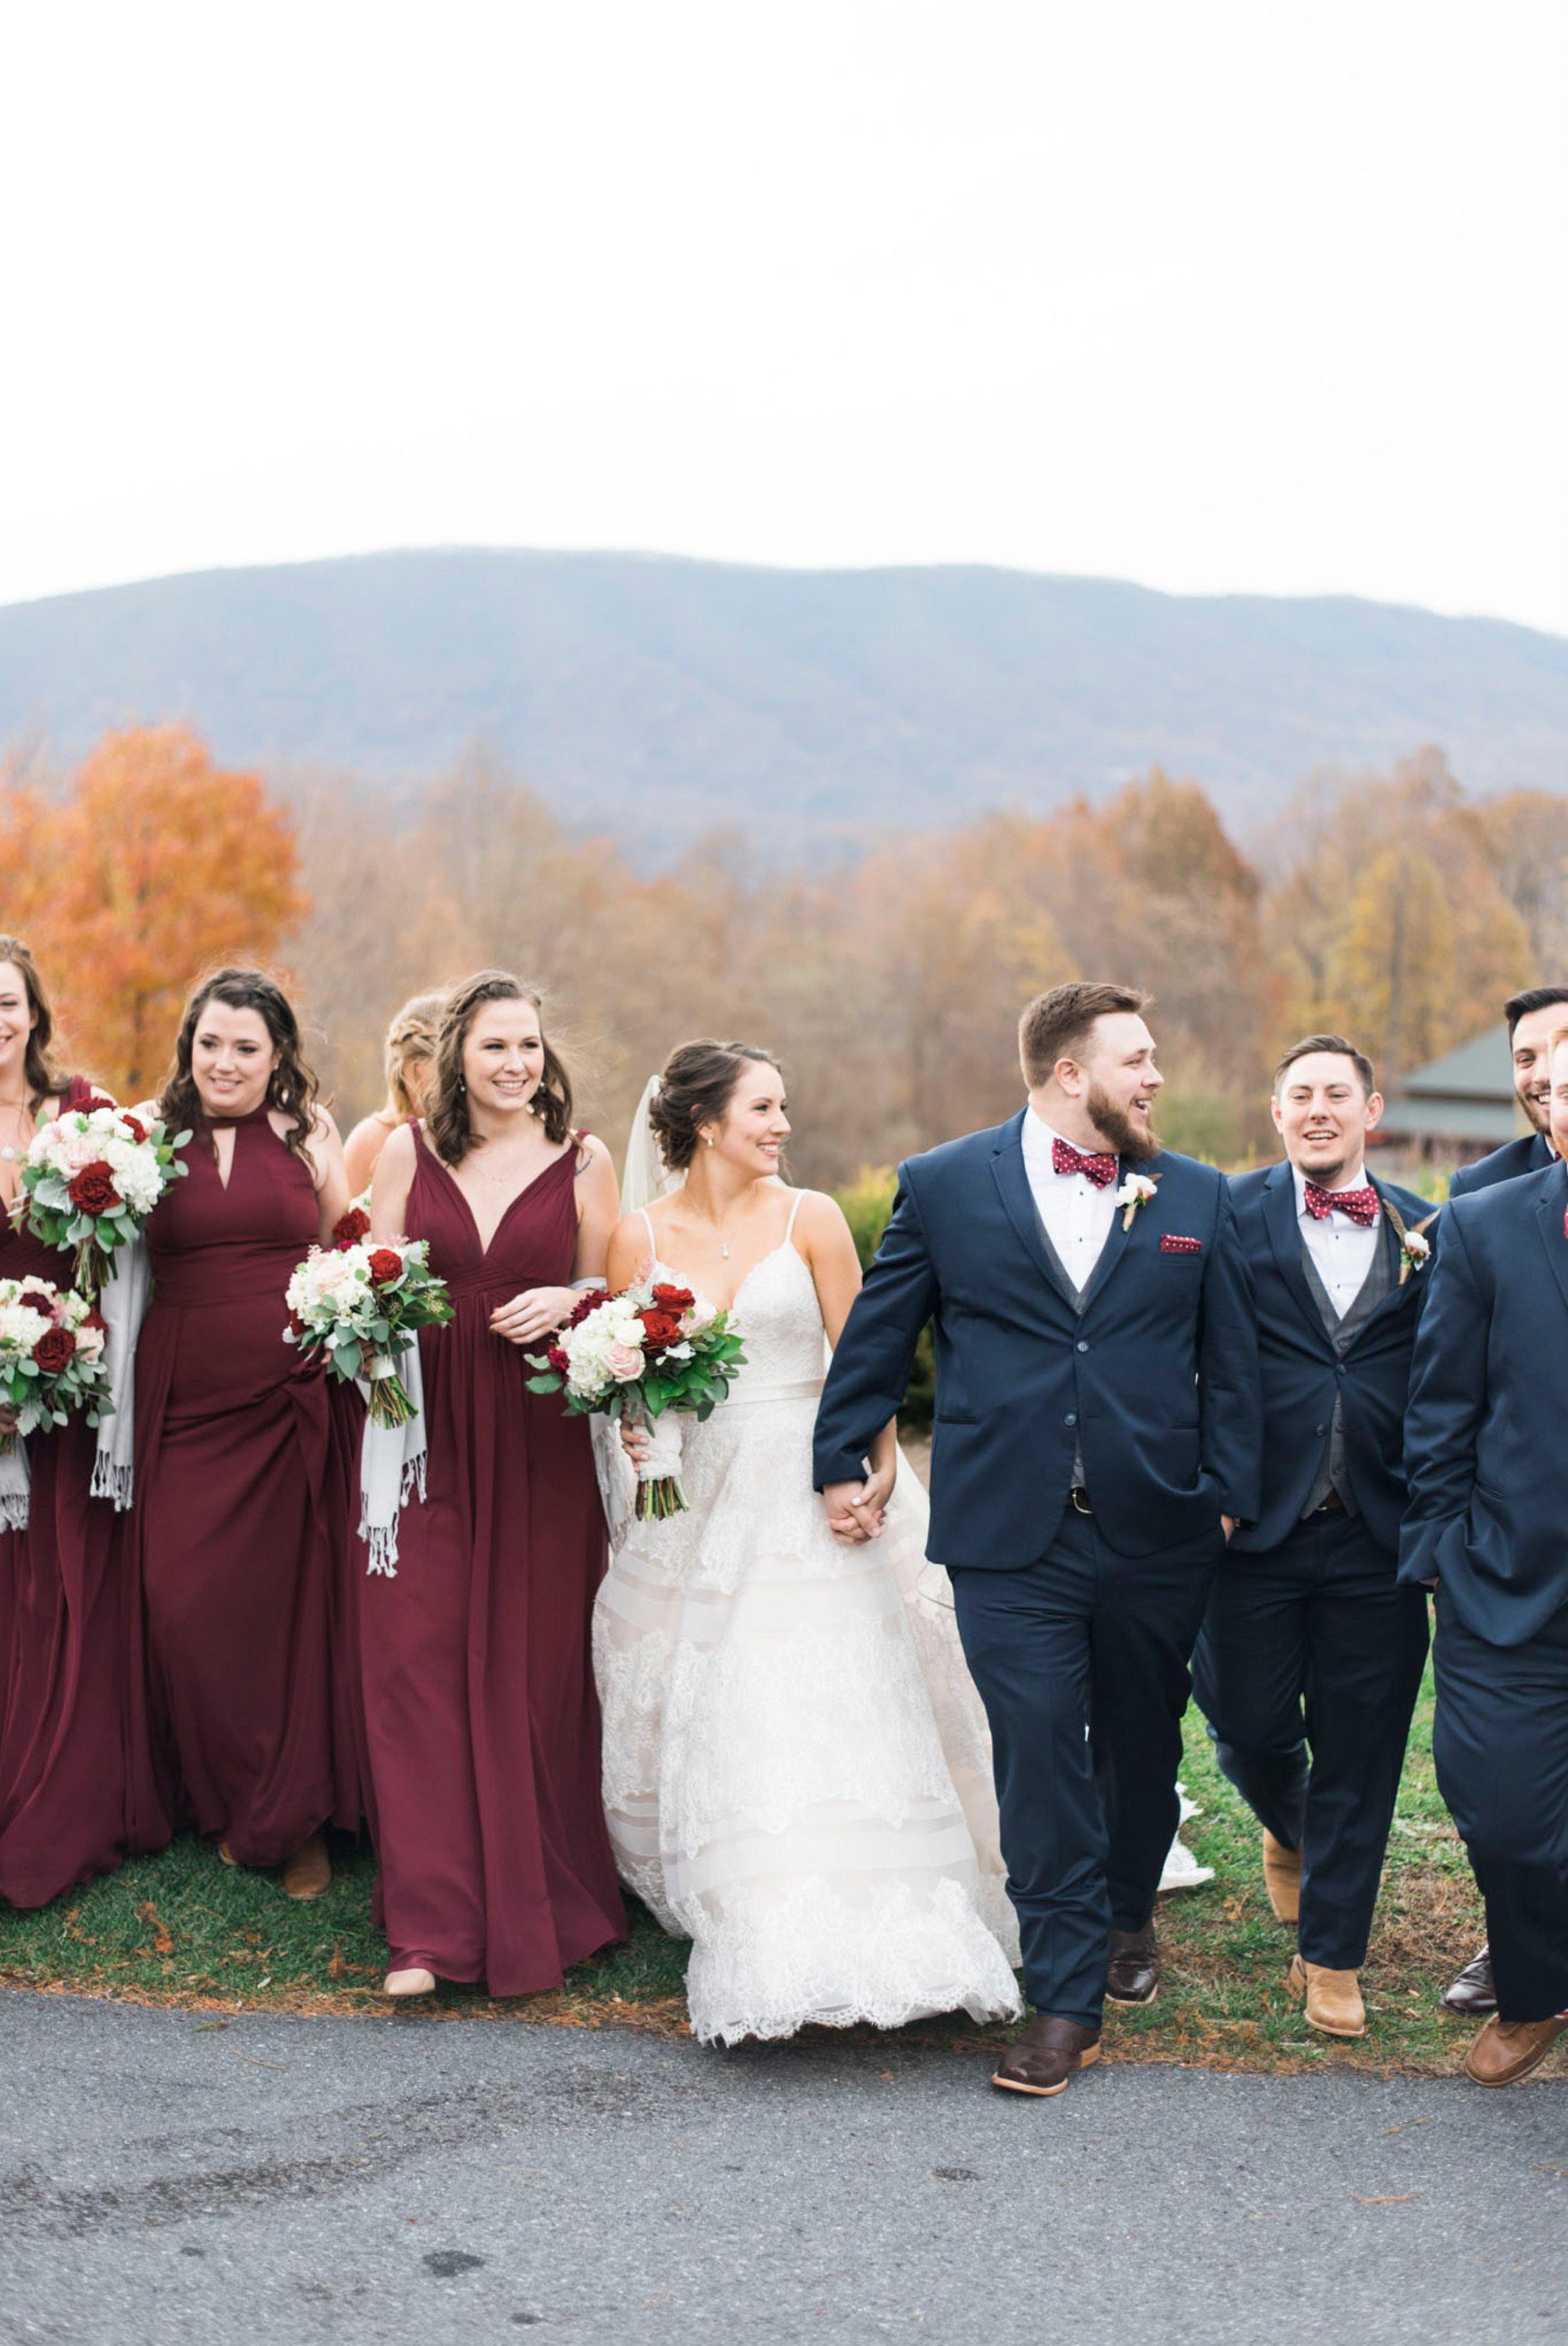 IrvineEstate_LexingtonVA_Wedding_FallWedding_VirginiaWeddingPhotographer 70.jpg